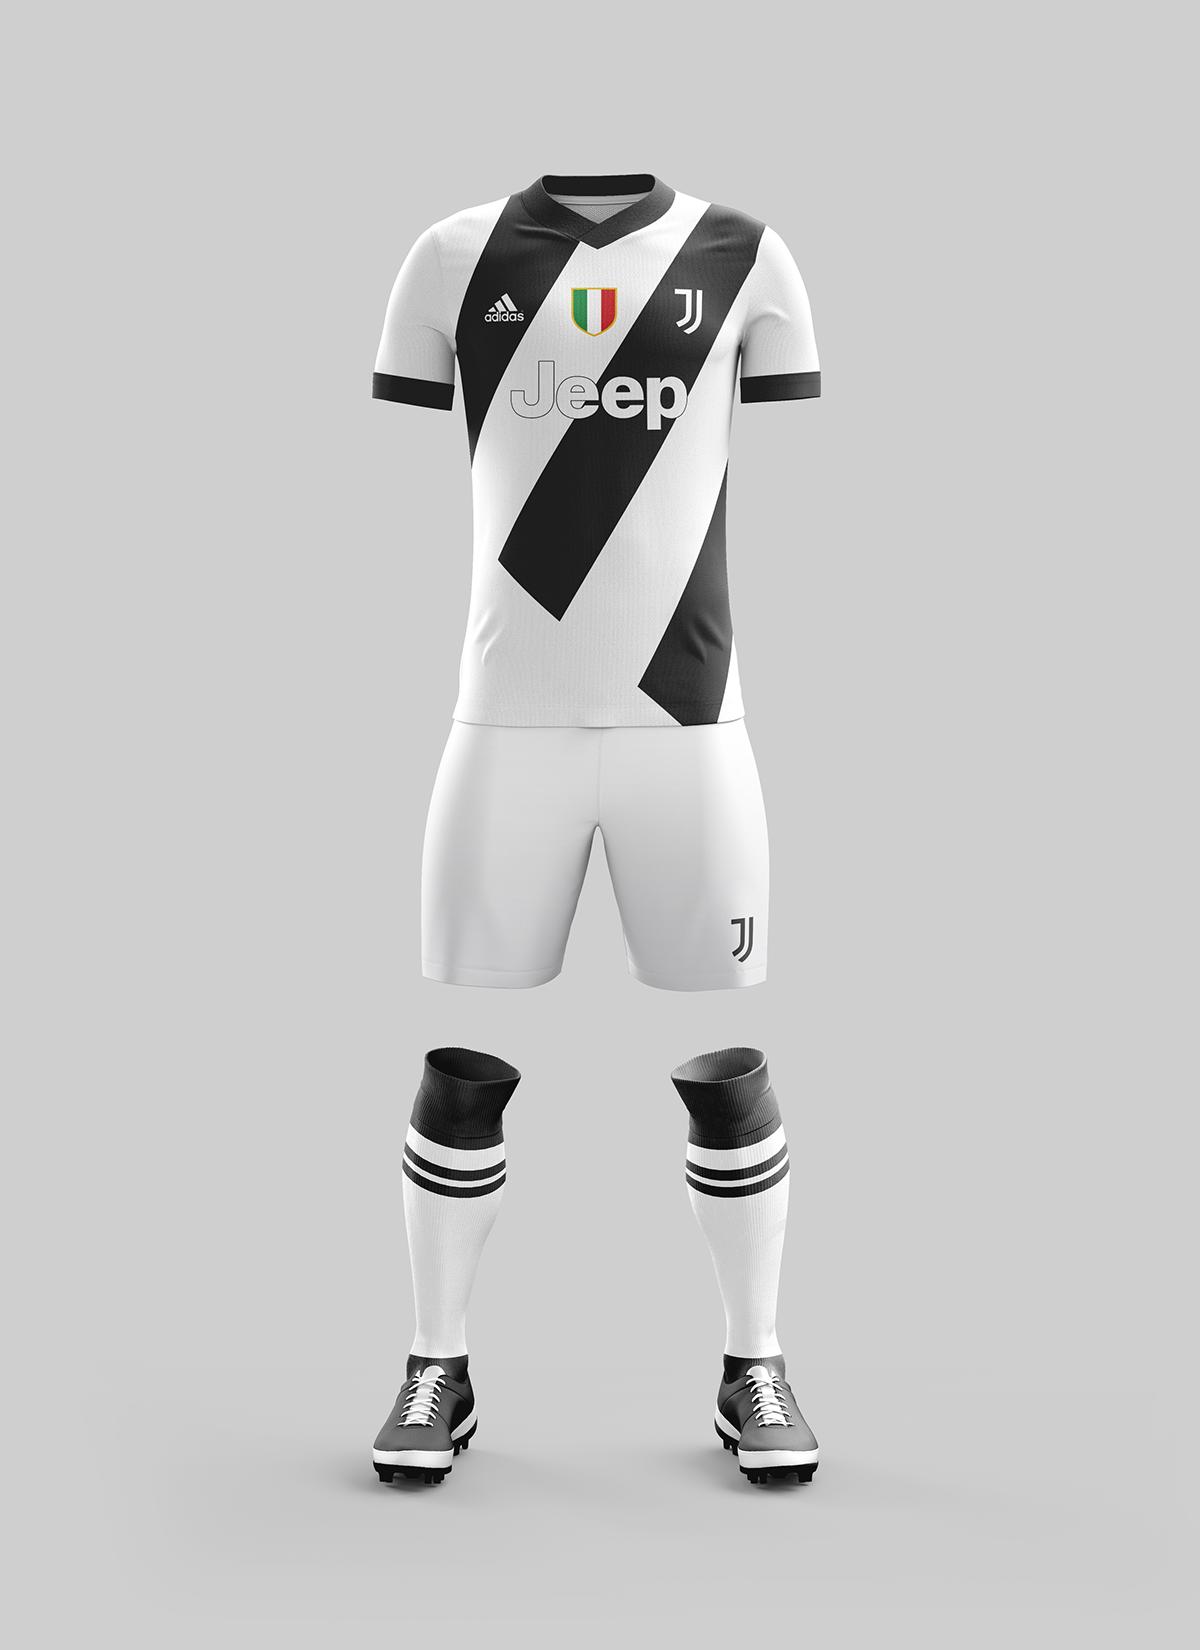 Juventus FC Home Kit Concept - 2017-2018 Season on Behance ... 07bf0e01b3d3d